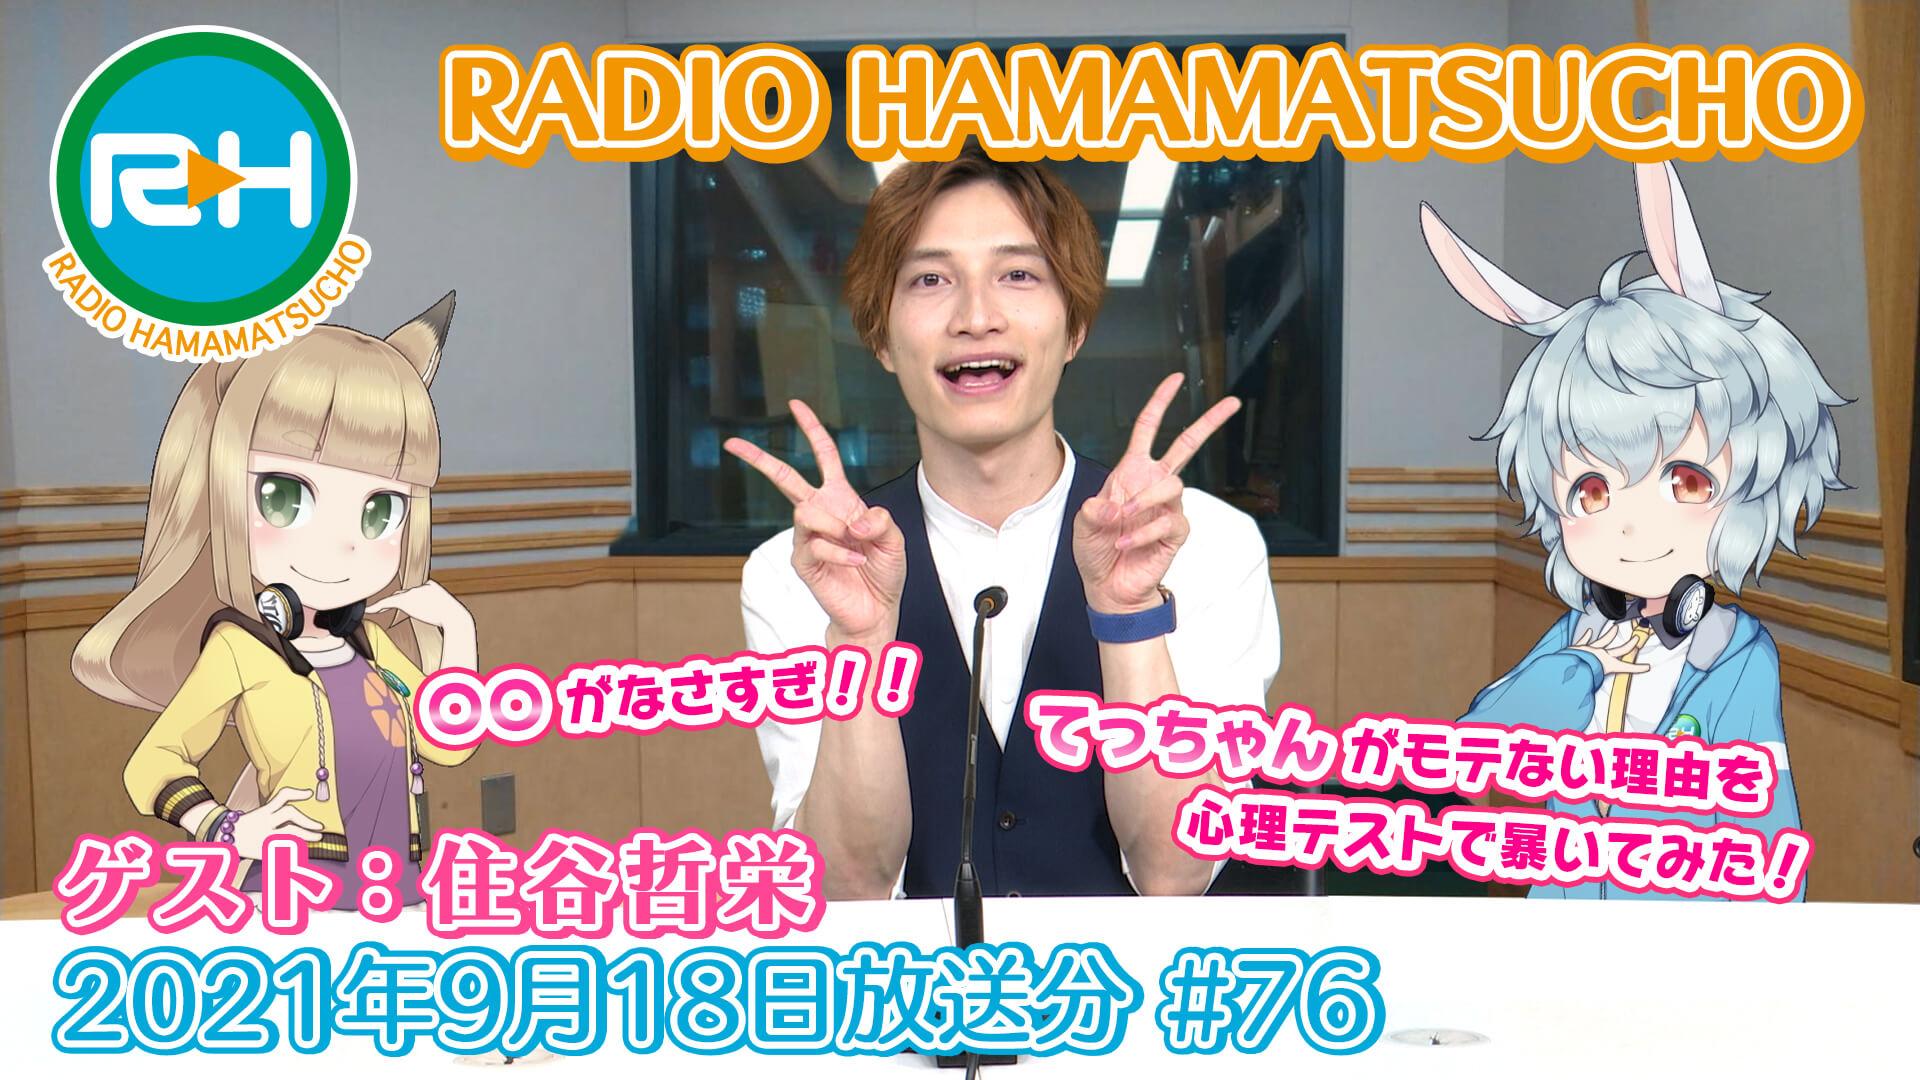 RADIO HAMAMATSUCHO 第76回 (2021年9月18日放送分) ゲスト: 住谷哲栄